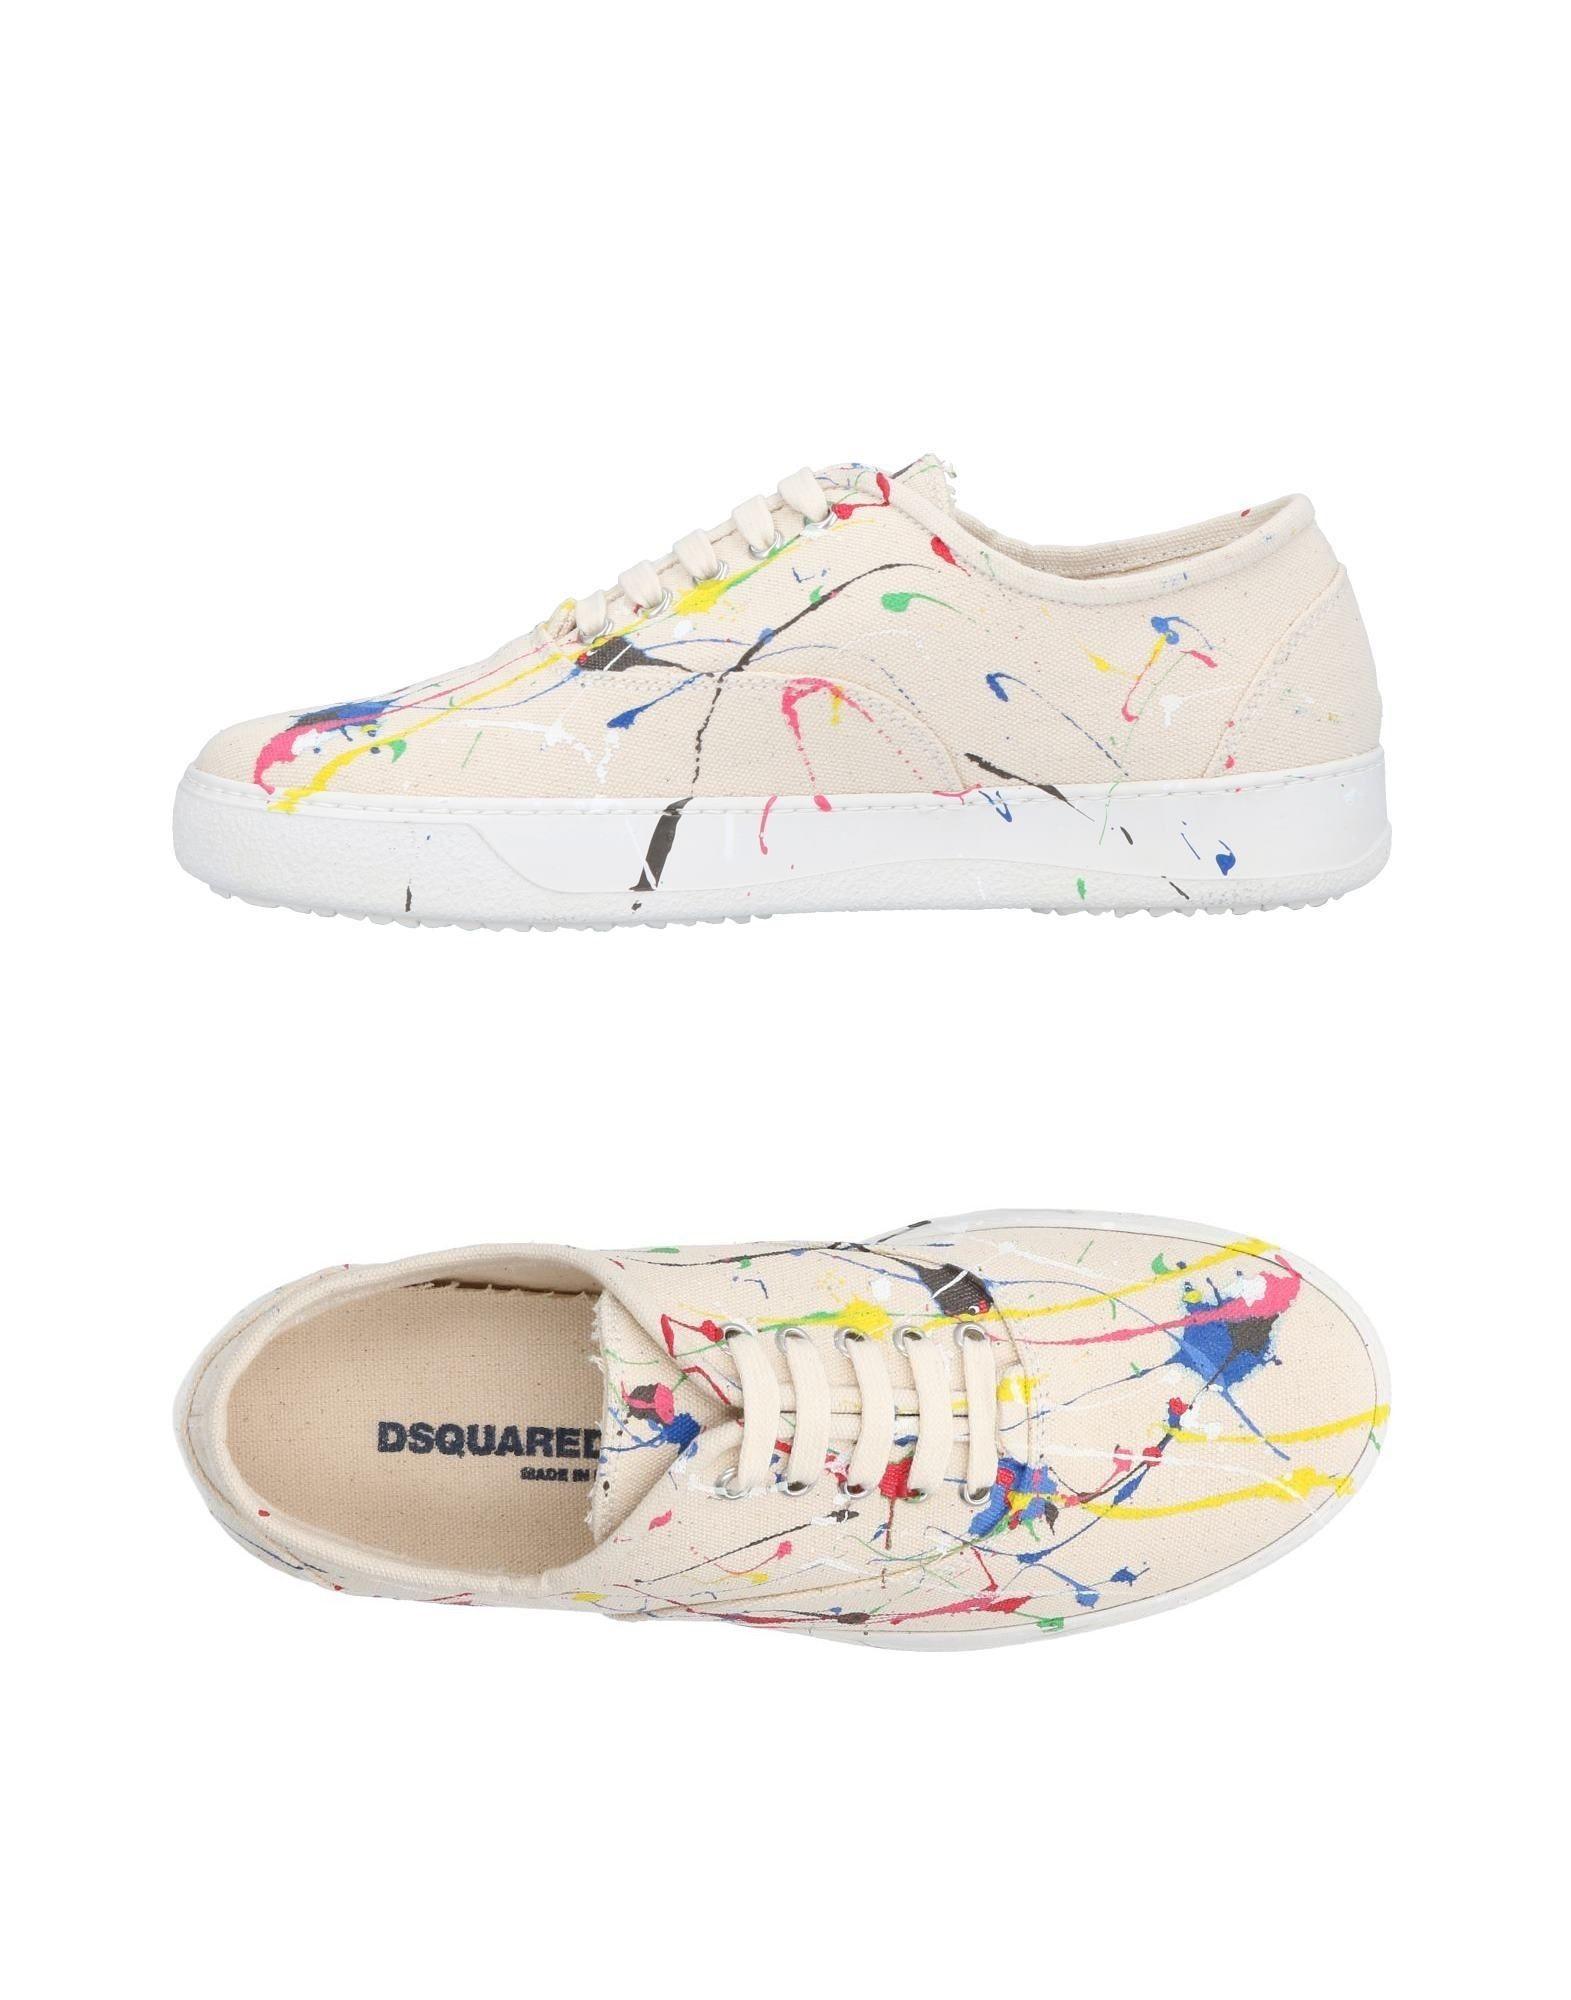 Dsquared2 Sneakers Herren  11469989PF Gute Qualität beliebte Schuhe